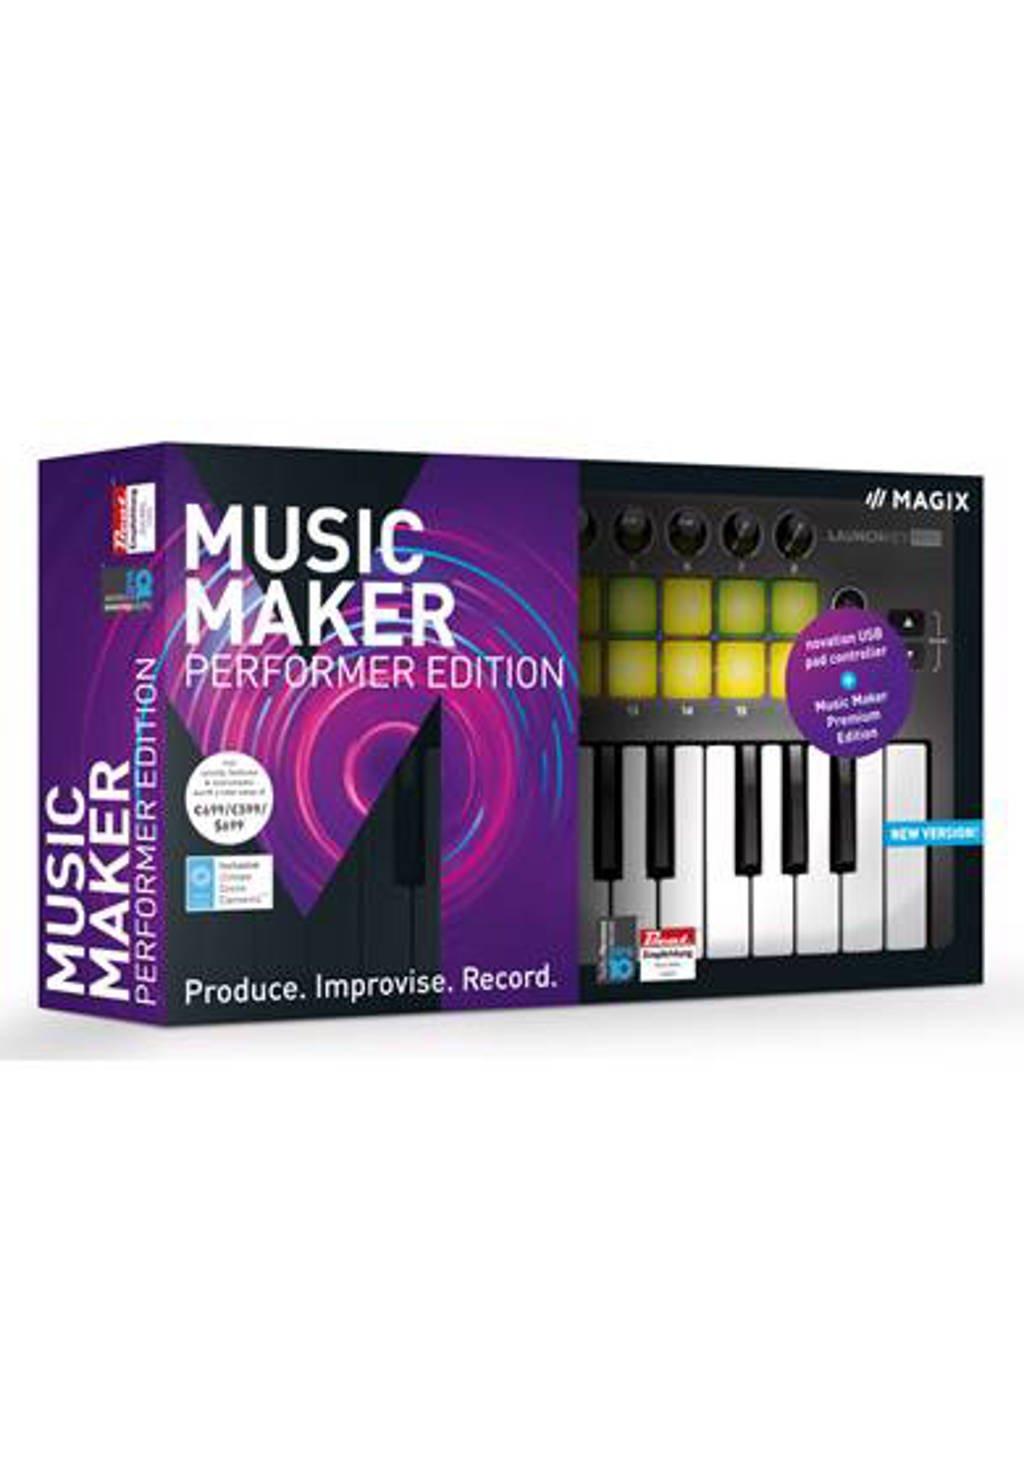 Magix music maker performer 2018 (PC)